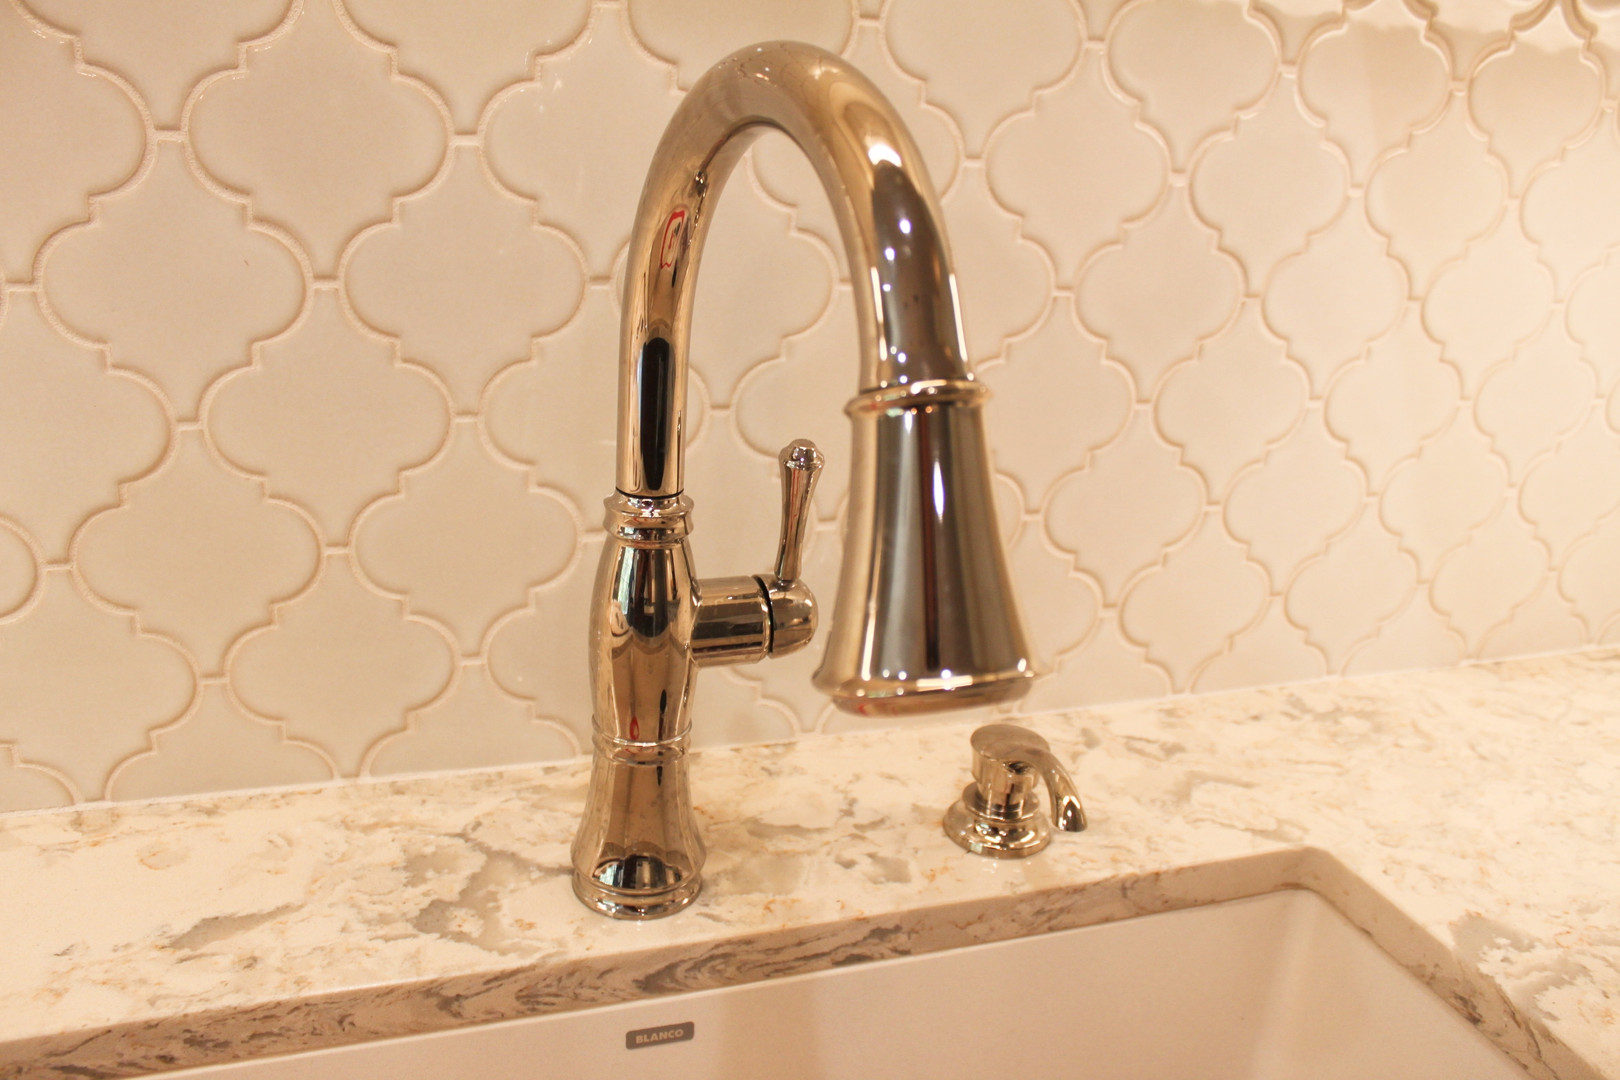 meadowbrook kitchen faucet.jpg